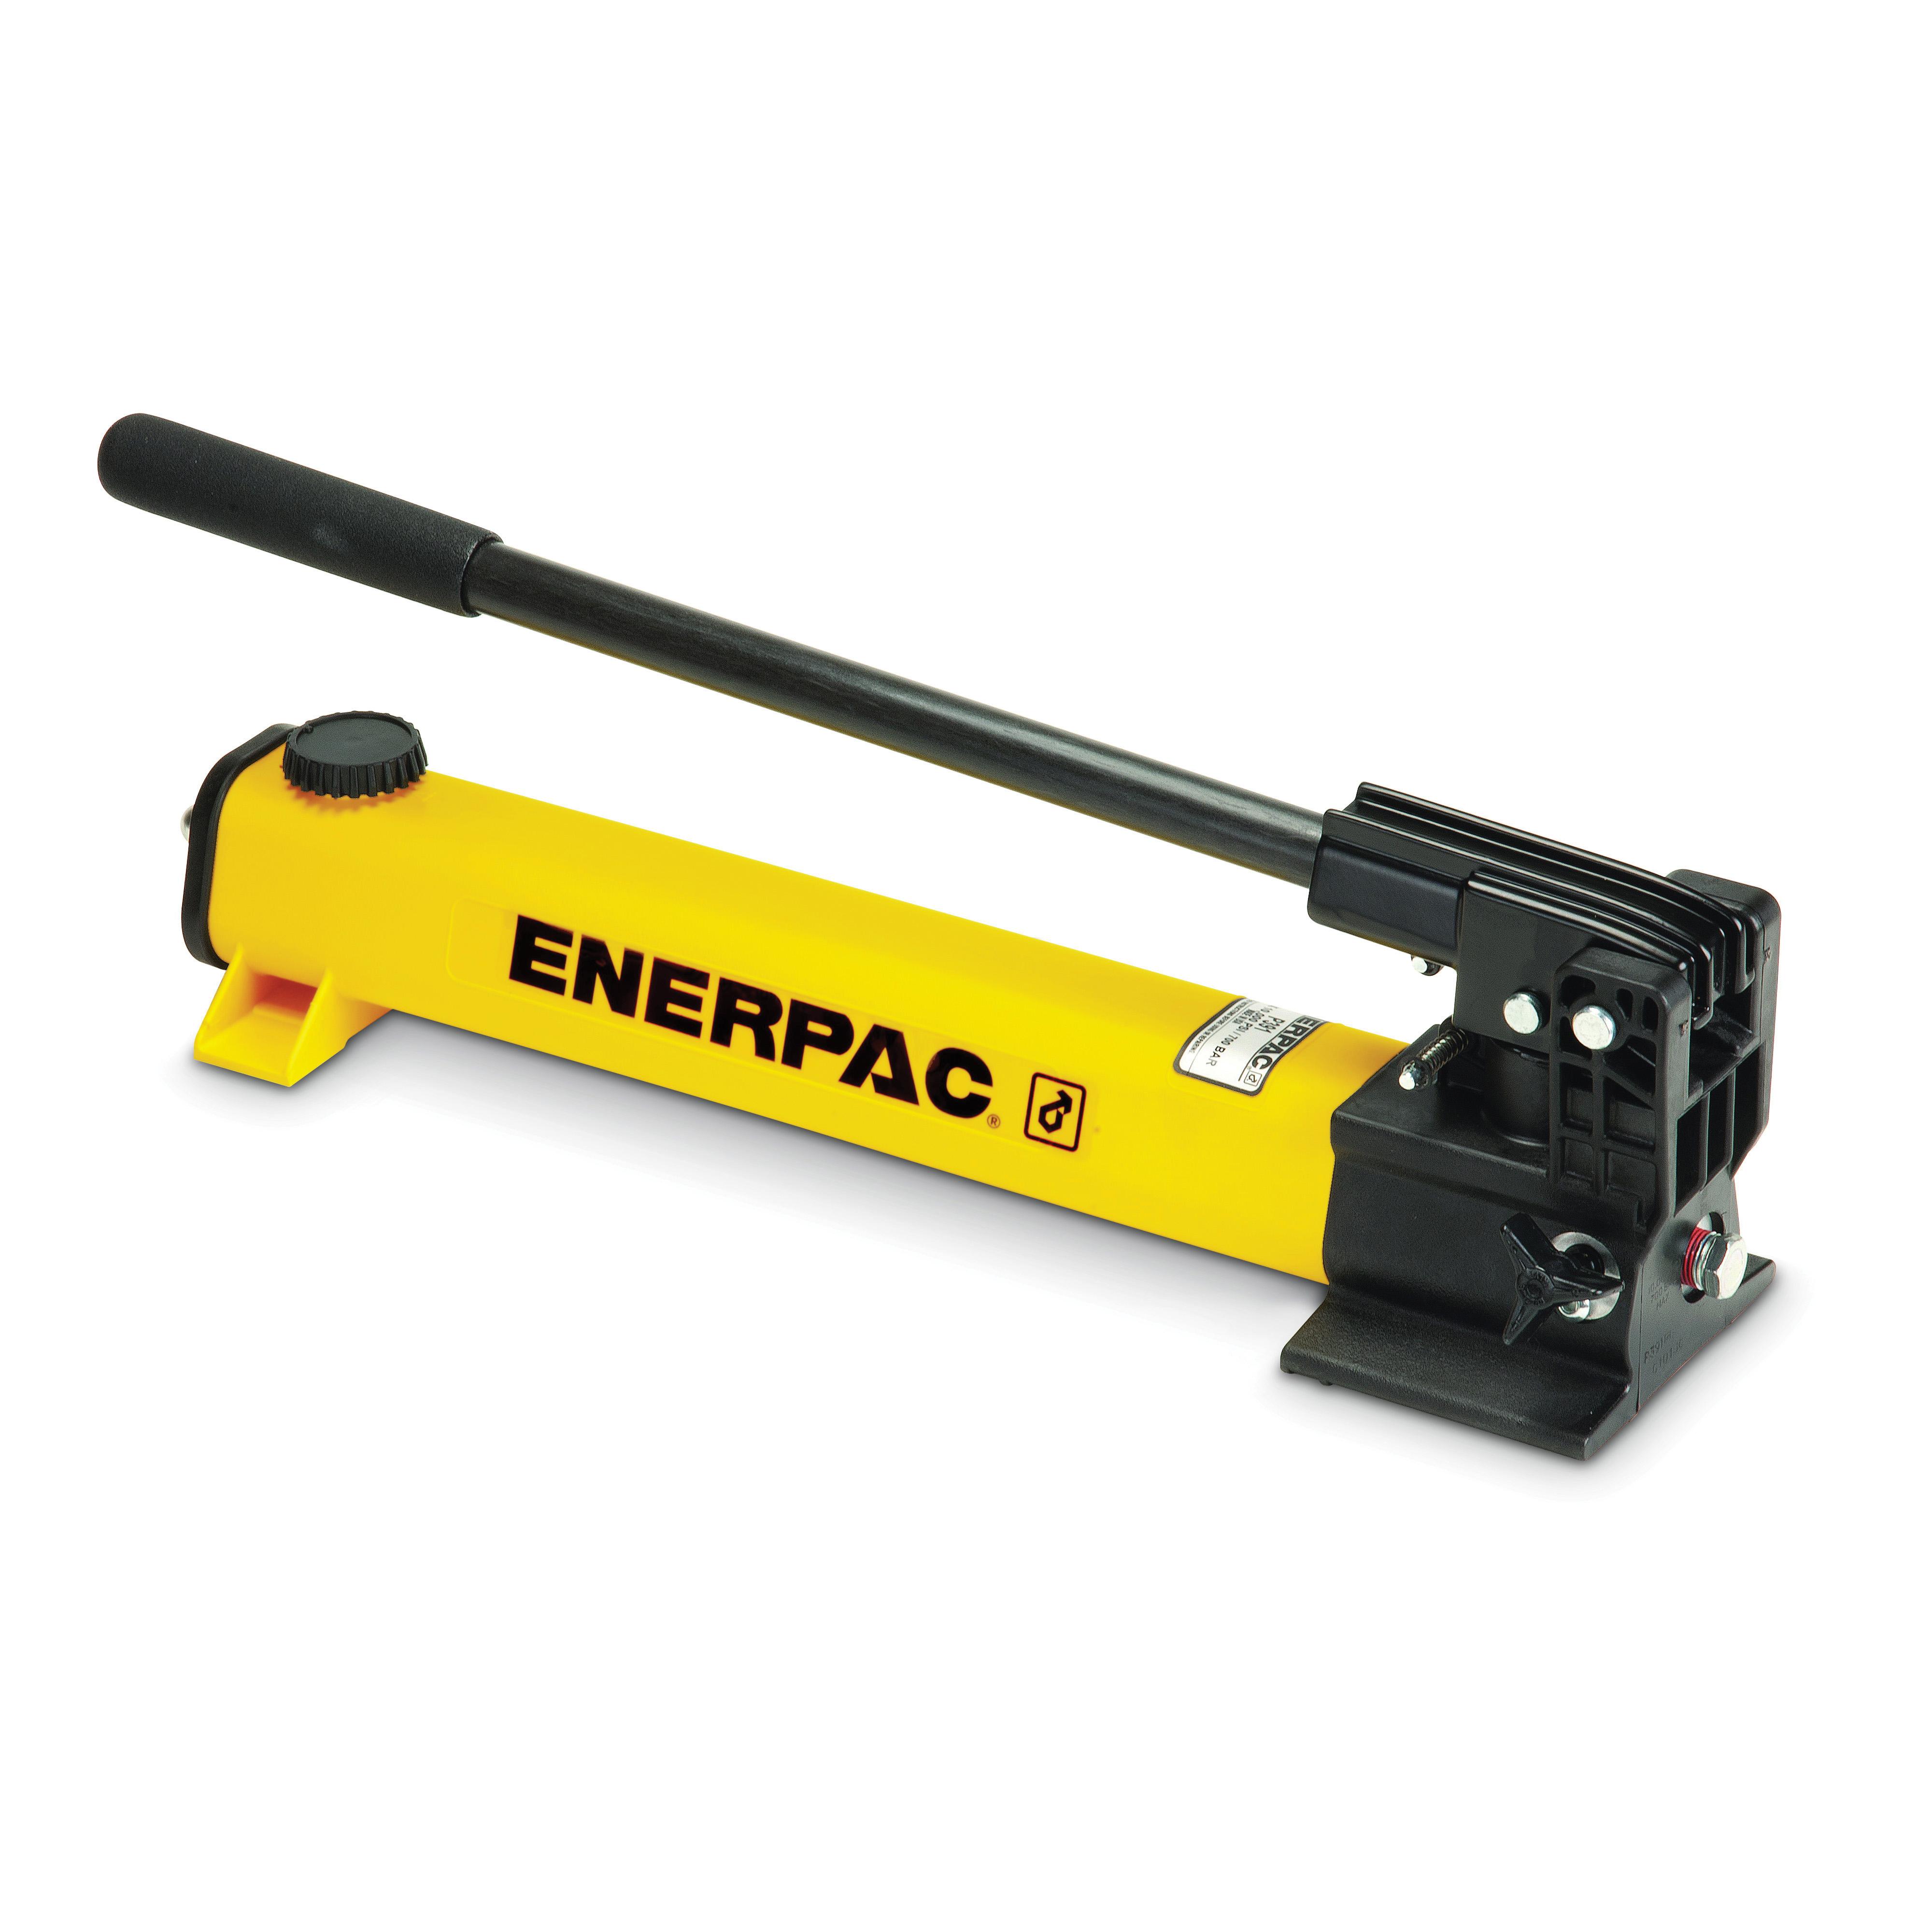 Enerpac® P-391 P-Series 1-Speed 2-Stage Lightweight Hydraulic Hand Pump, 55 cu-in Tank